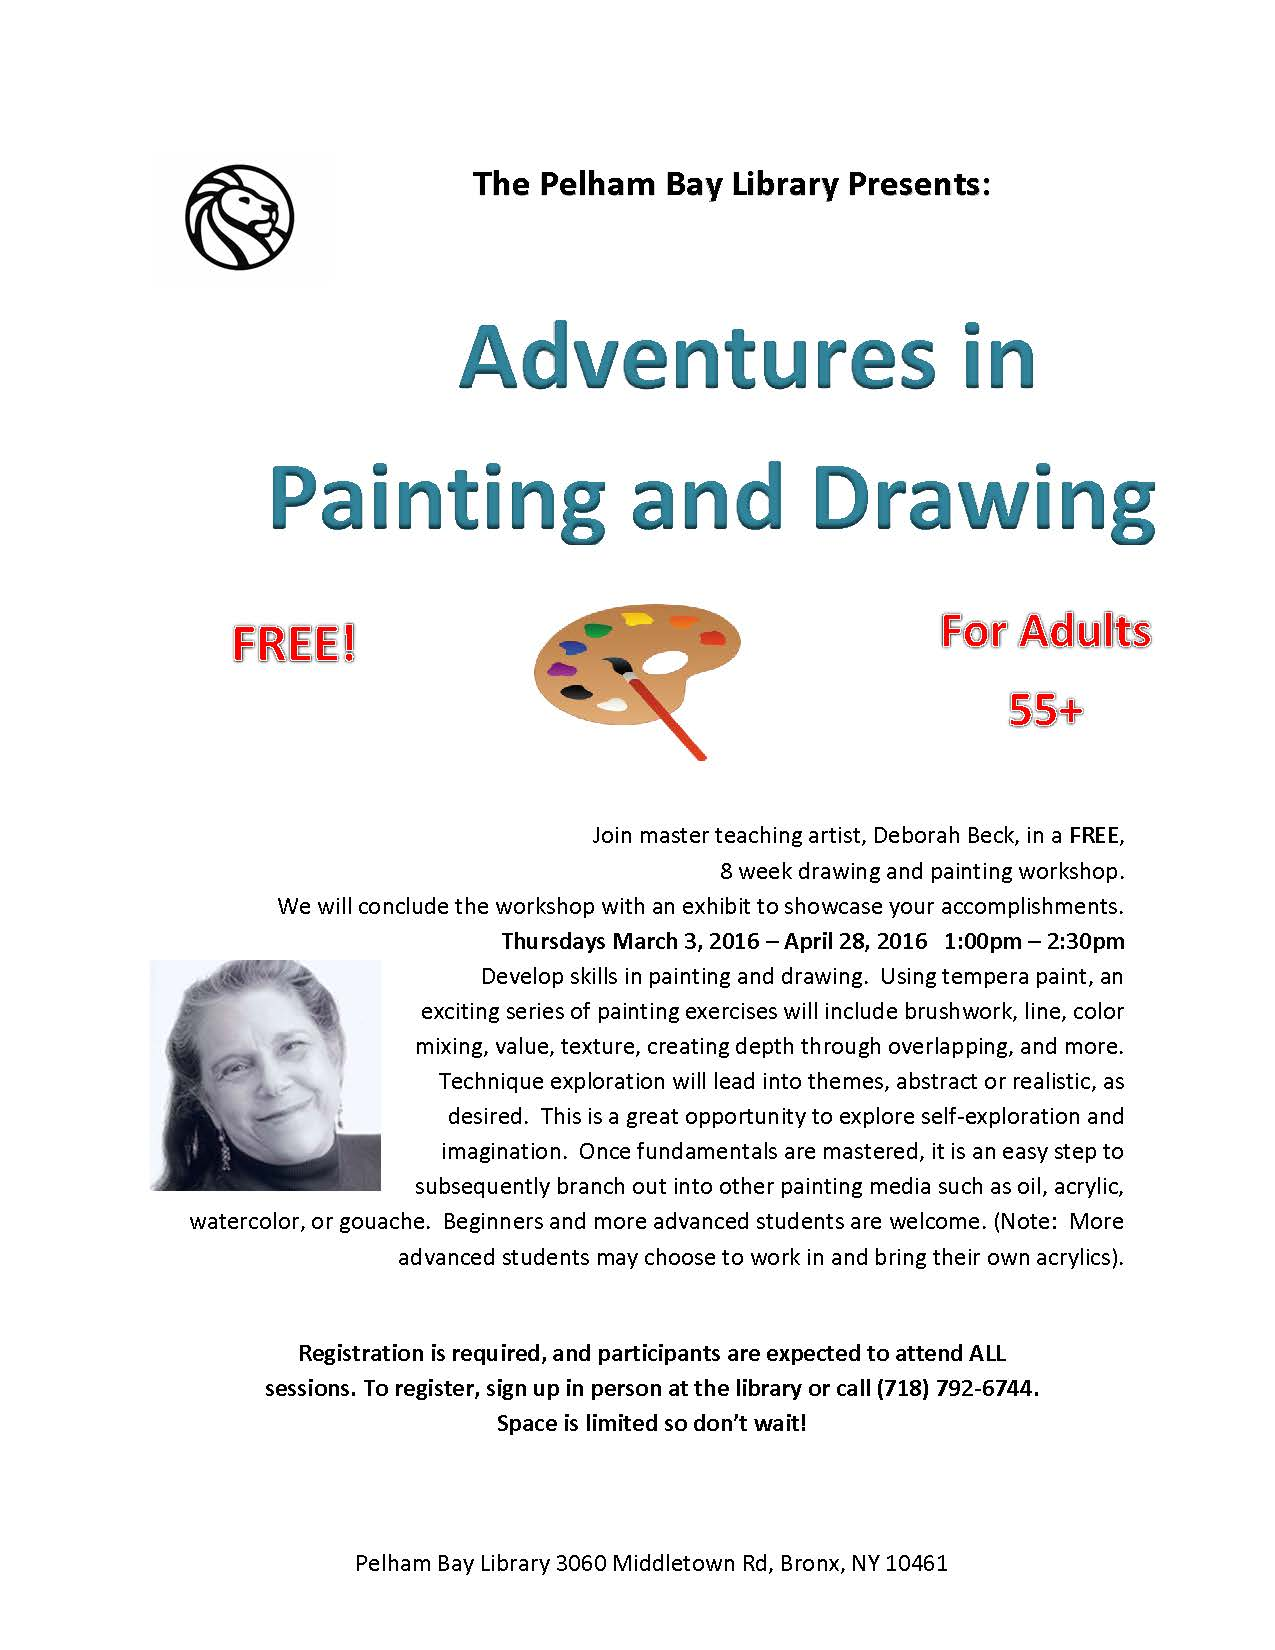 Art program flier